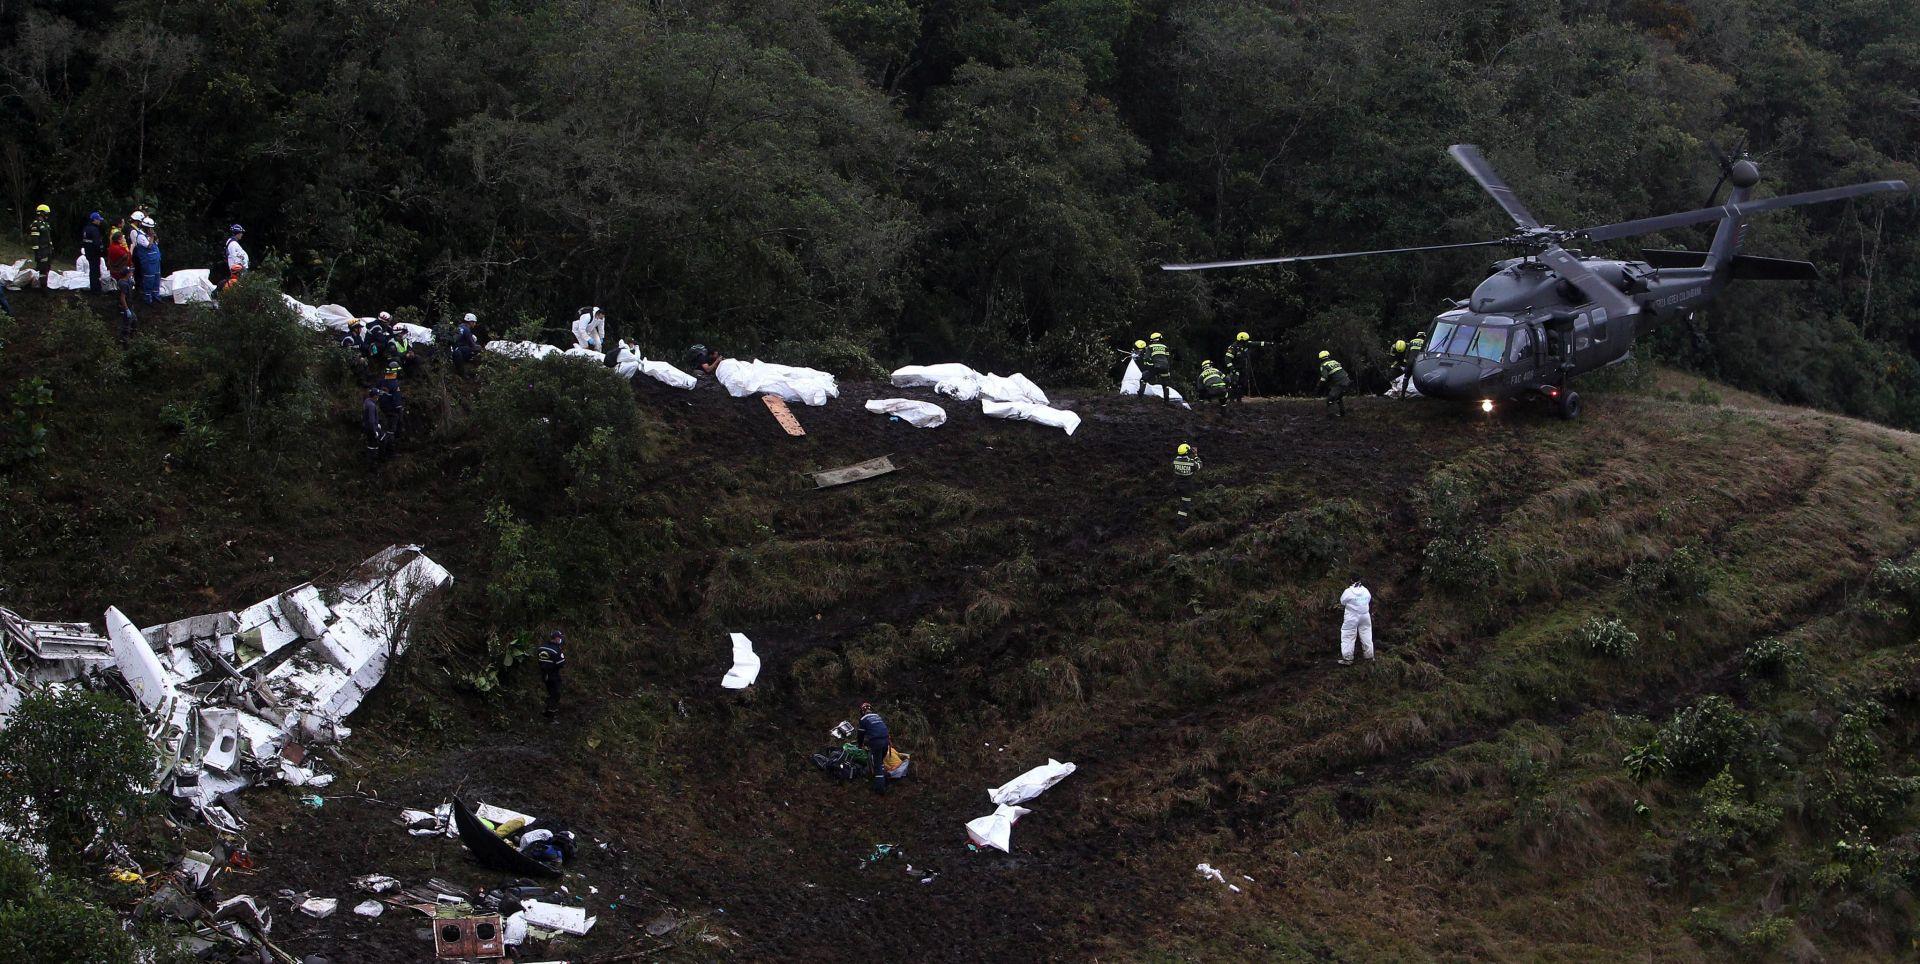 Uzrok pada kolumbijskog zrakoplova s nogometnom momčadi je ljudska pogreška